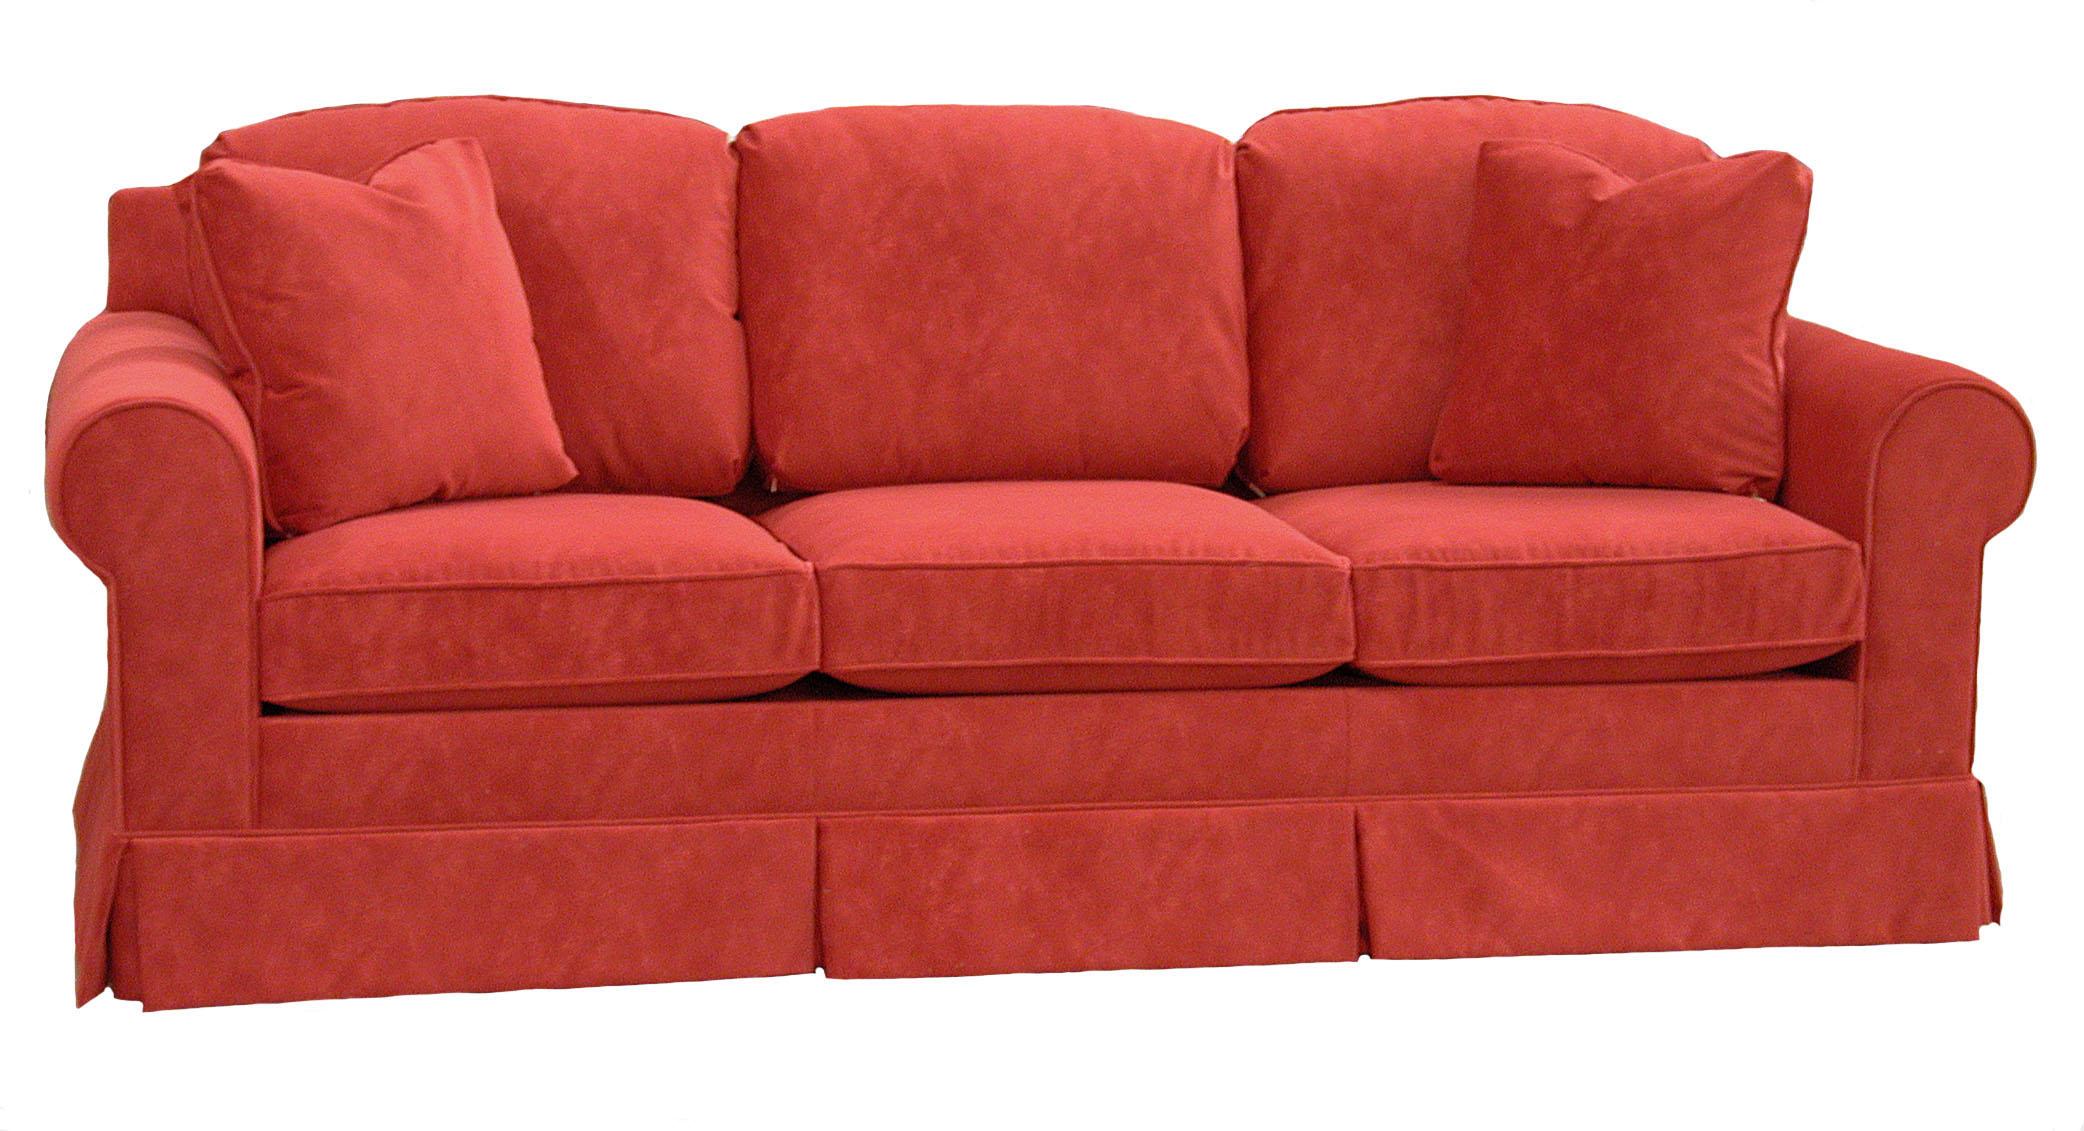 Hughes Queen Sleeper Sofa Carolina Chair North Carolina